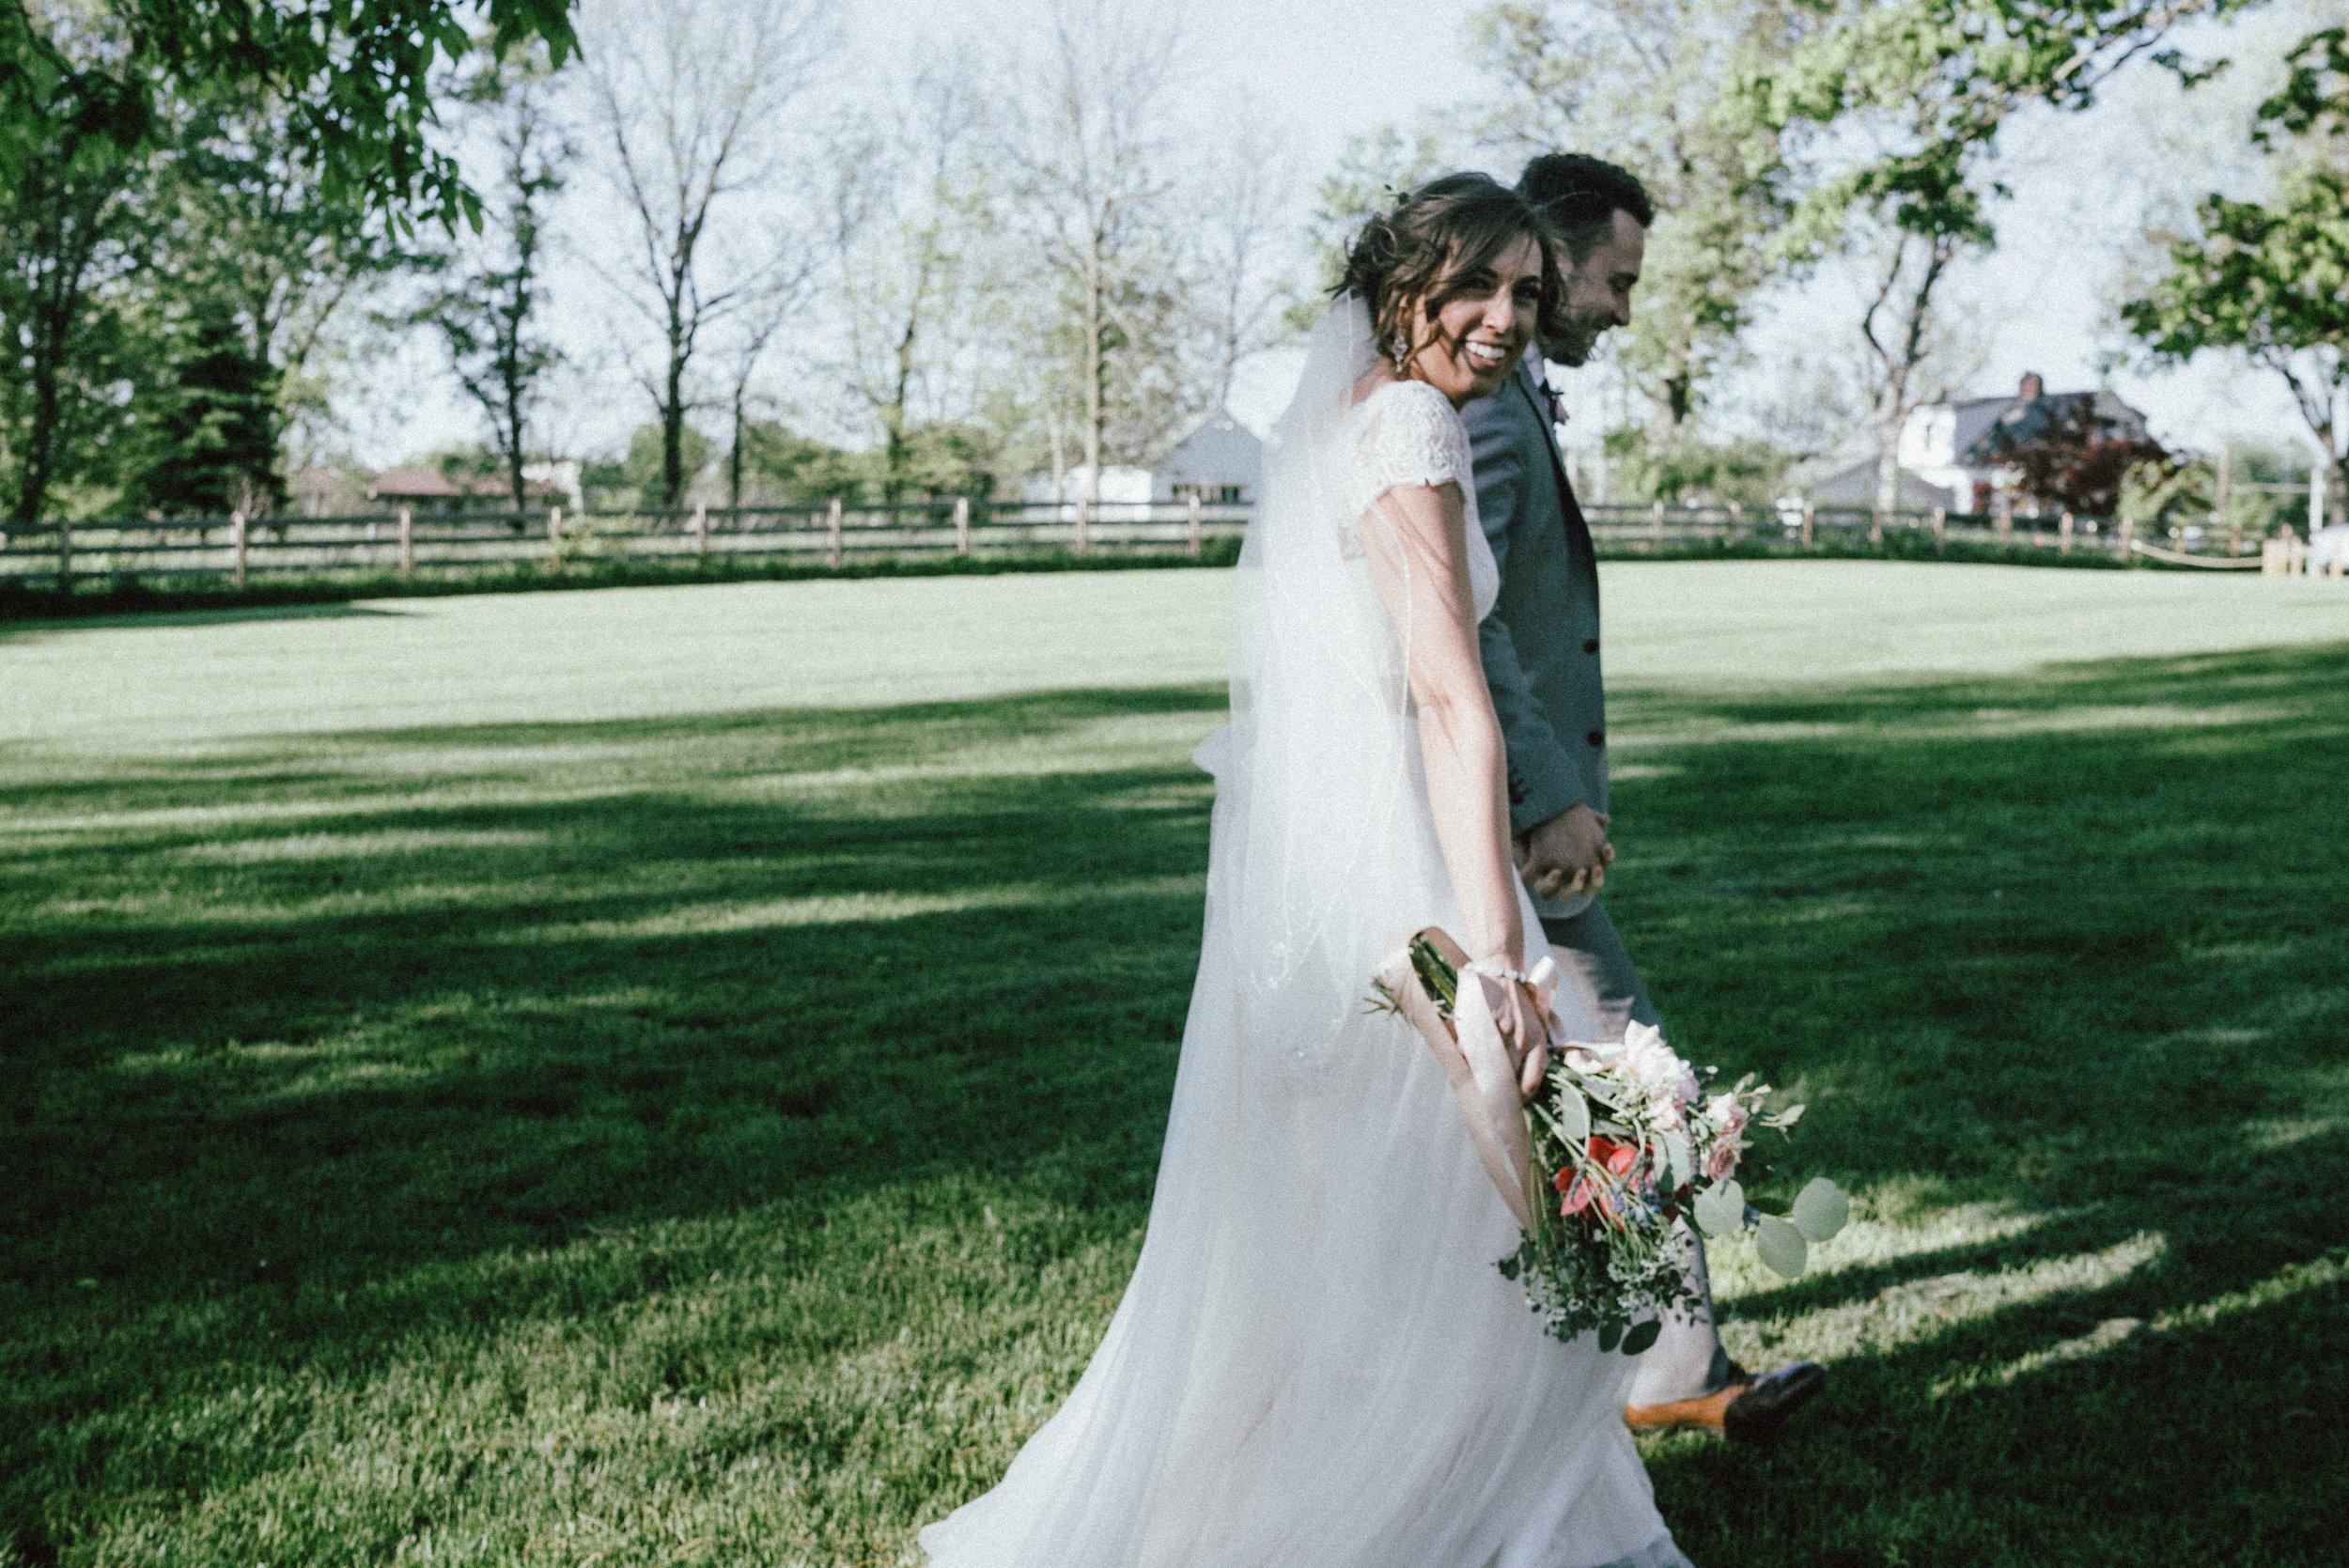 Steph-Ben-Blog-Indianapolis-Wedding-53.jpg